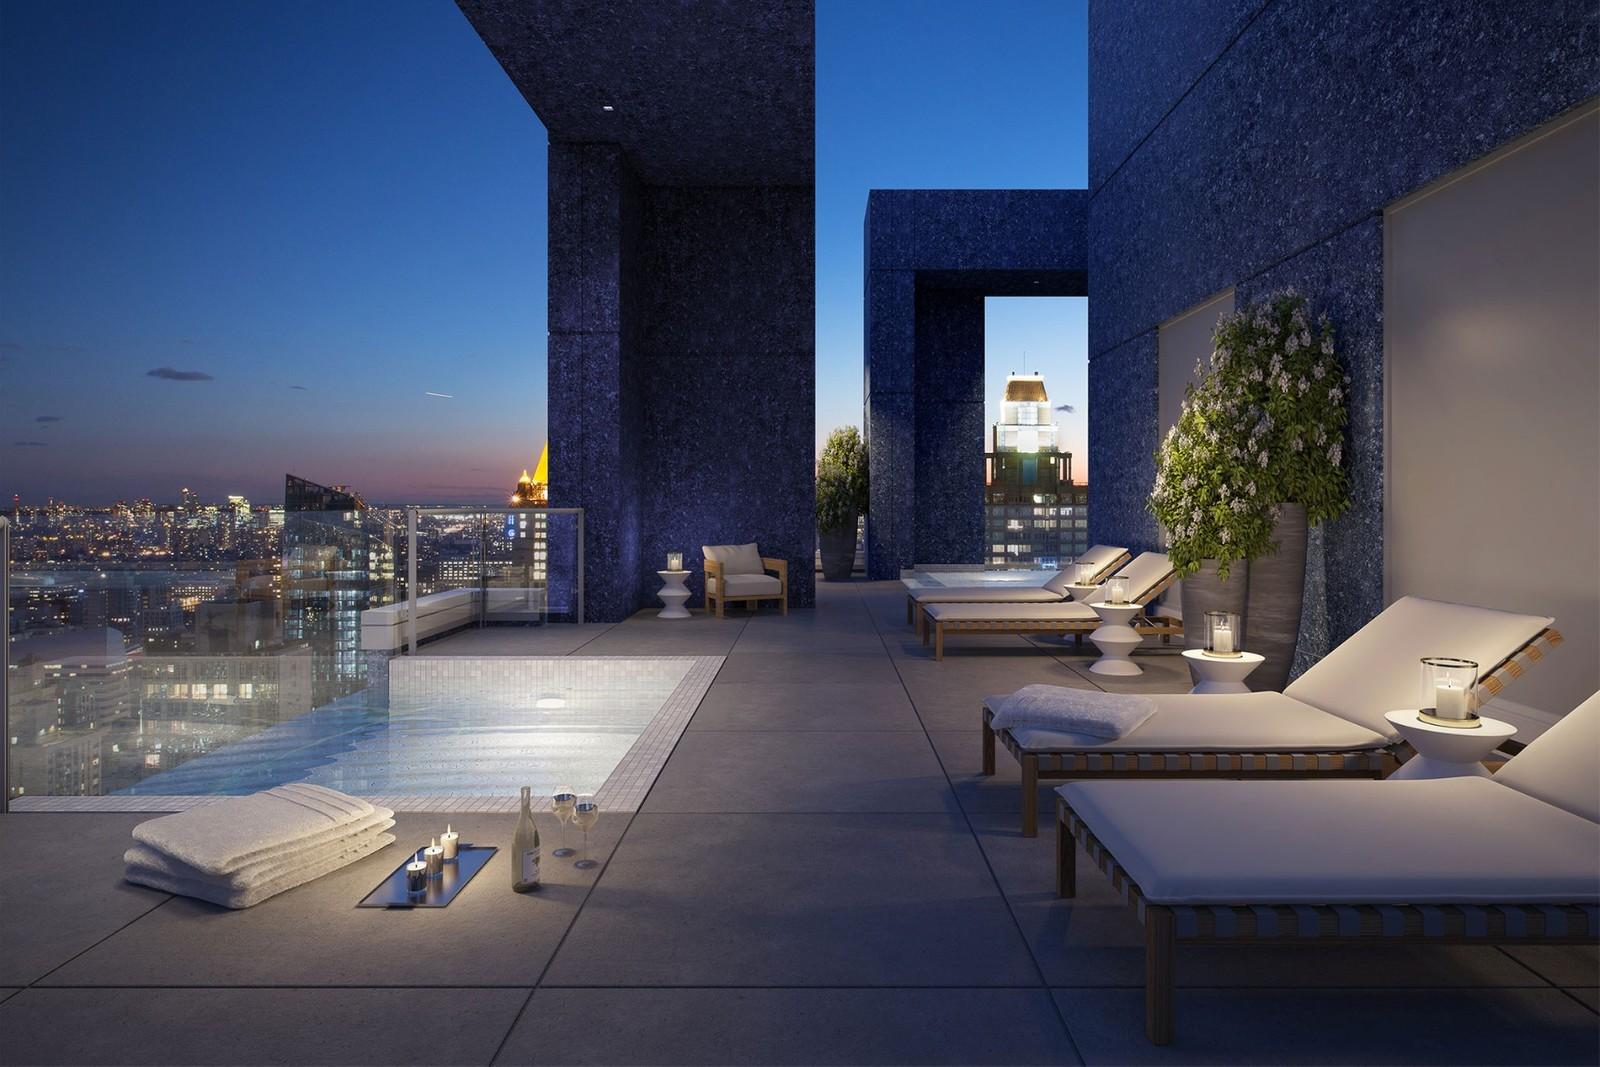 # Ahava Jerusalem, realtor, msl, property portal, real estate, property for sale, home, penthouse, house for sale, home, homes for sale, house for rent, luxury,  le penthouse, New York